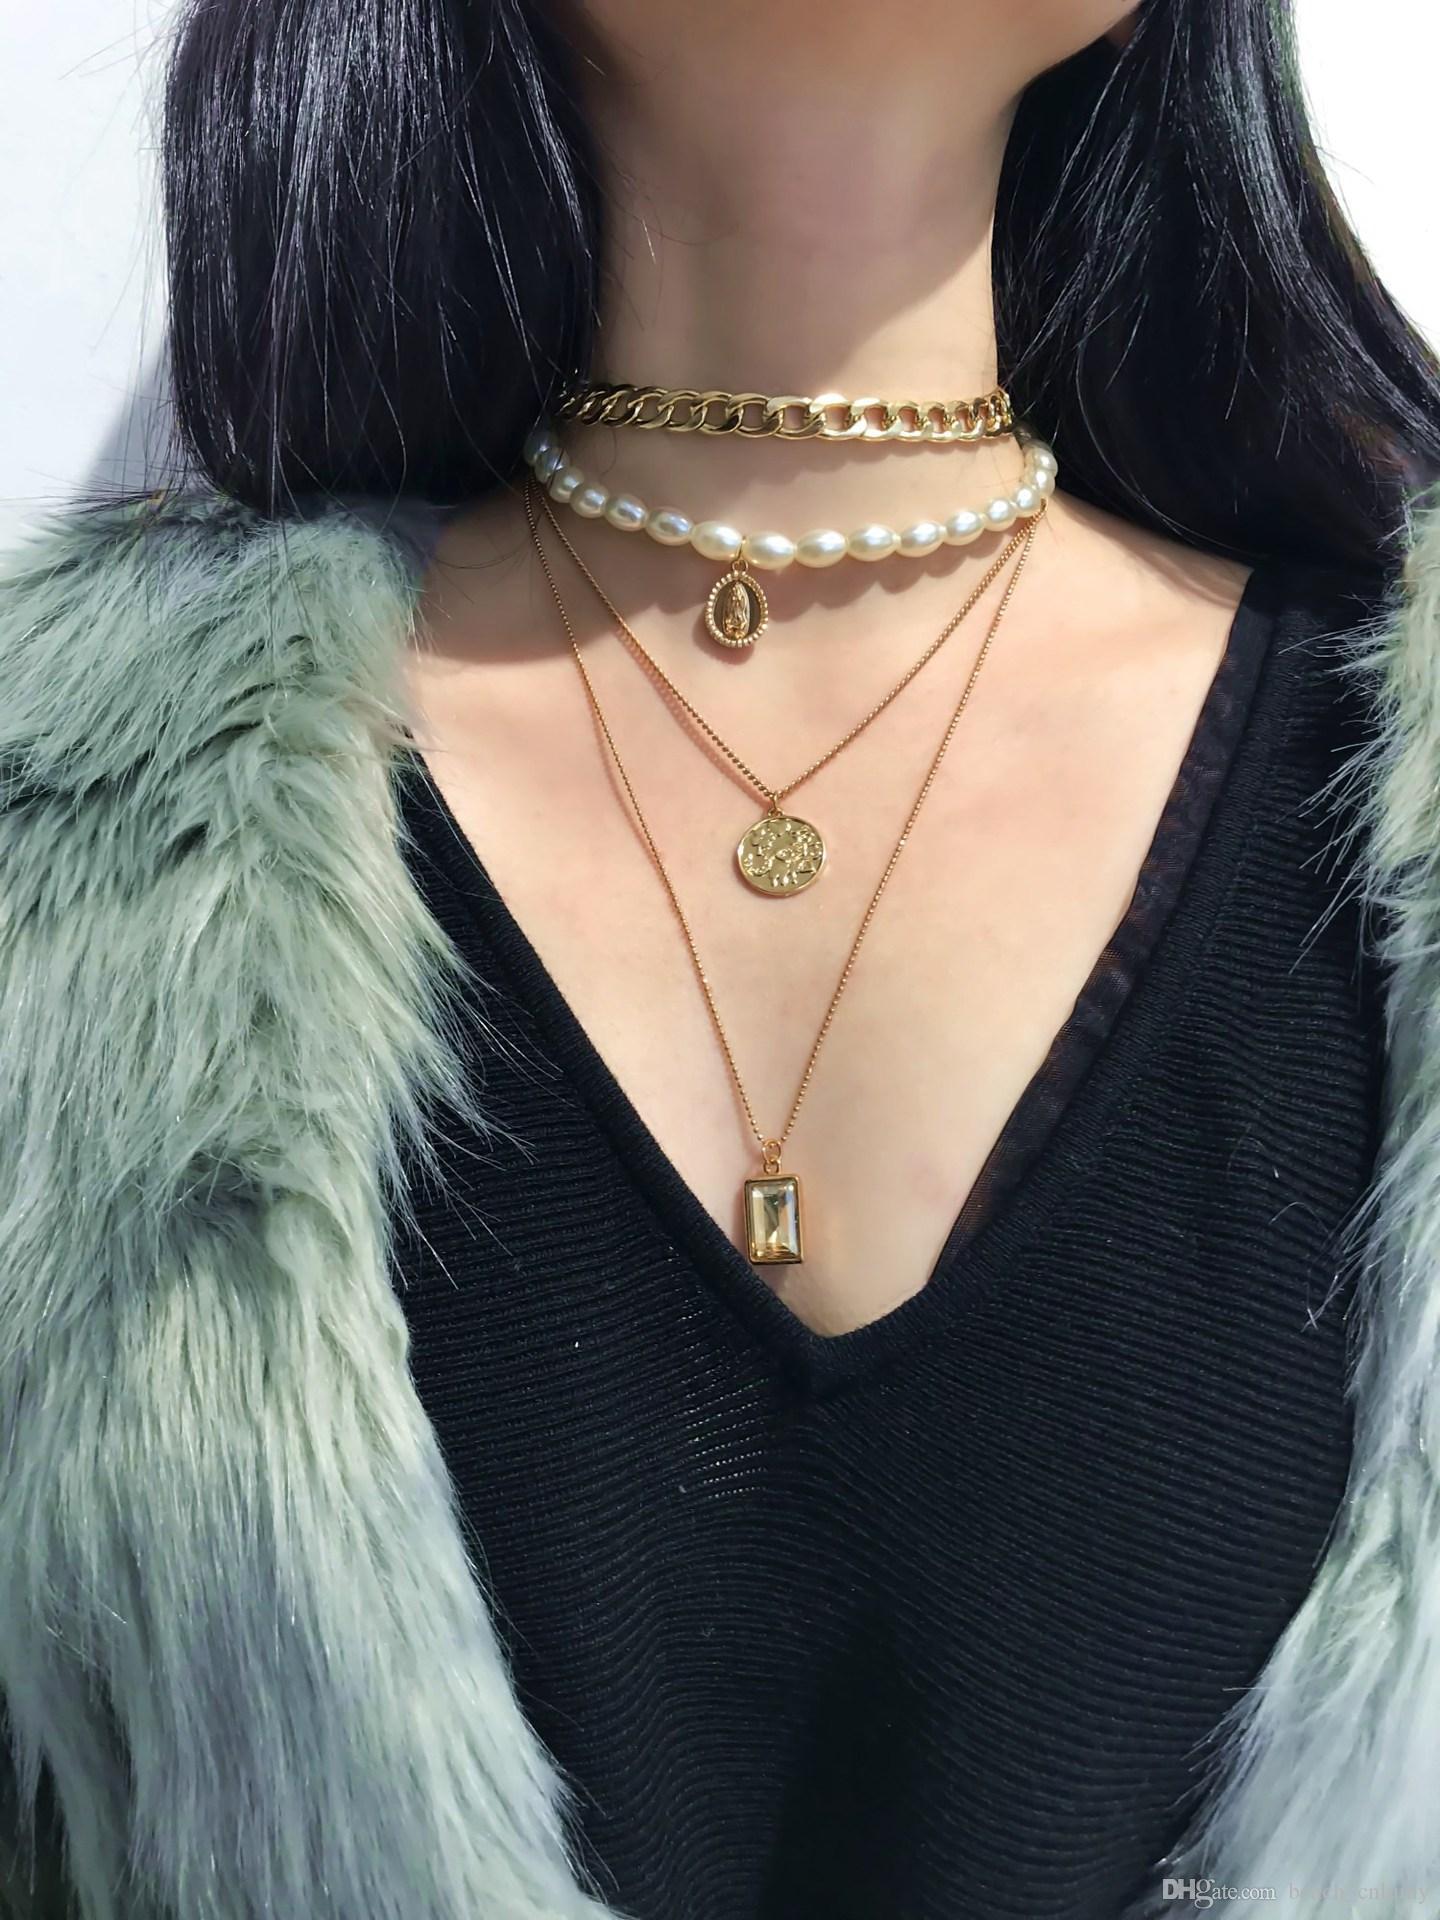 Shop Charm Pendant Wrap Link Necklace online. SheIn offers